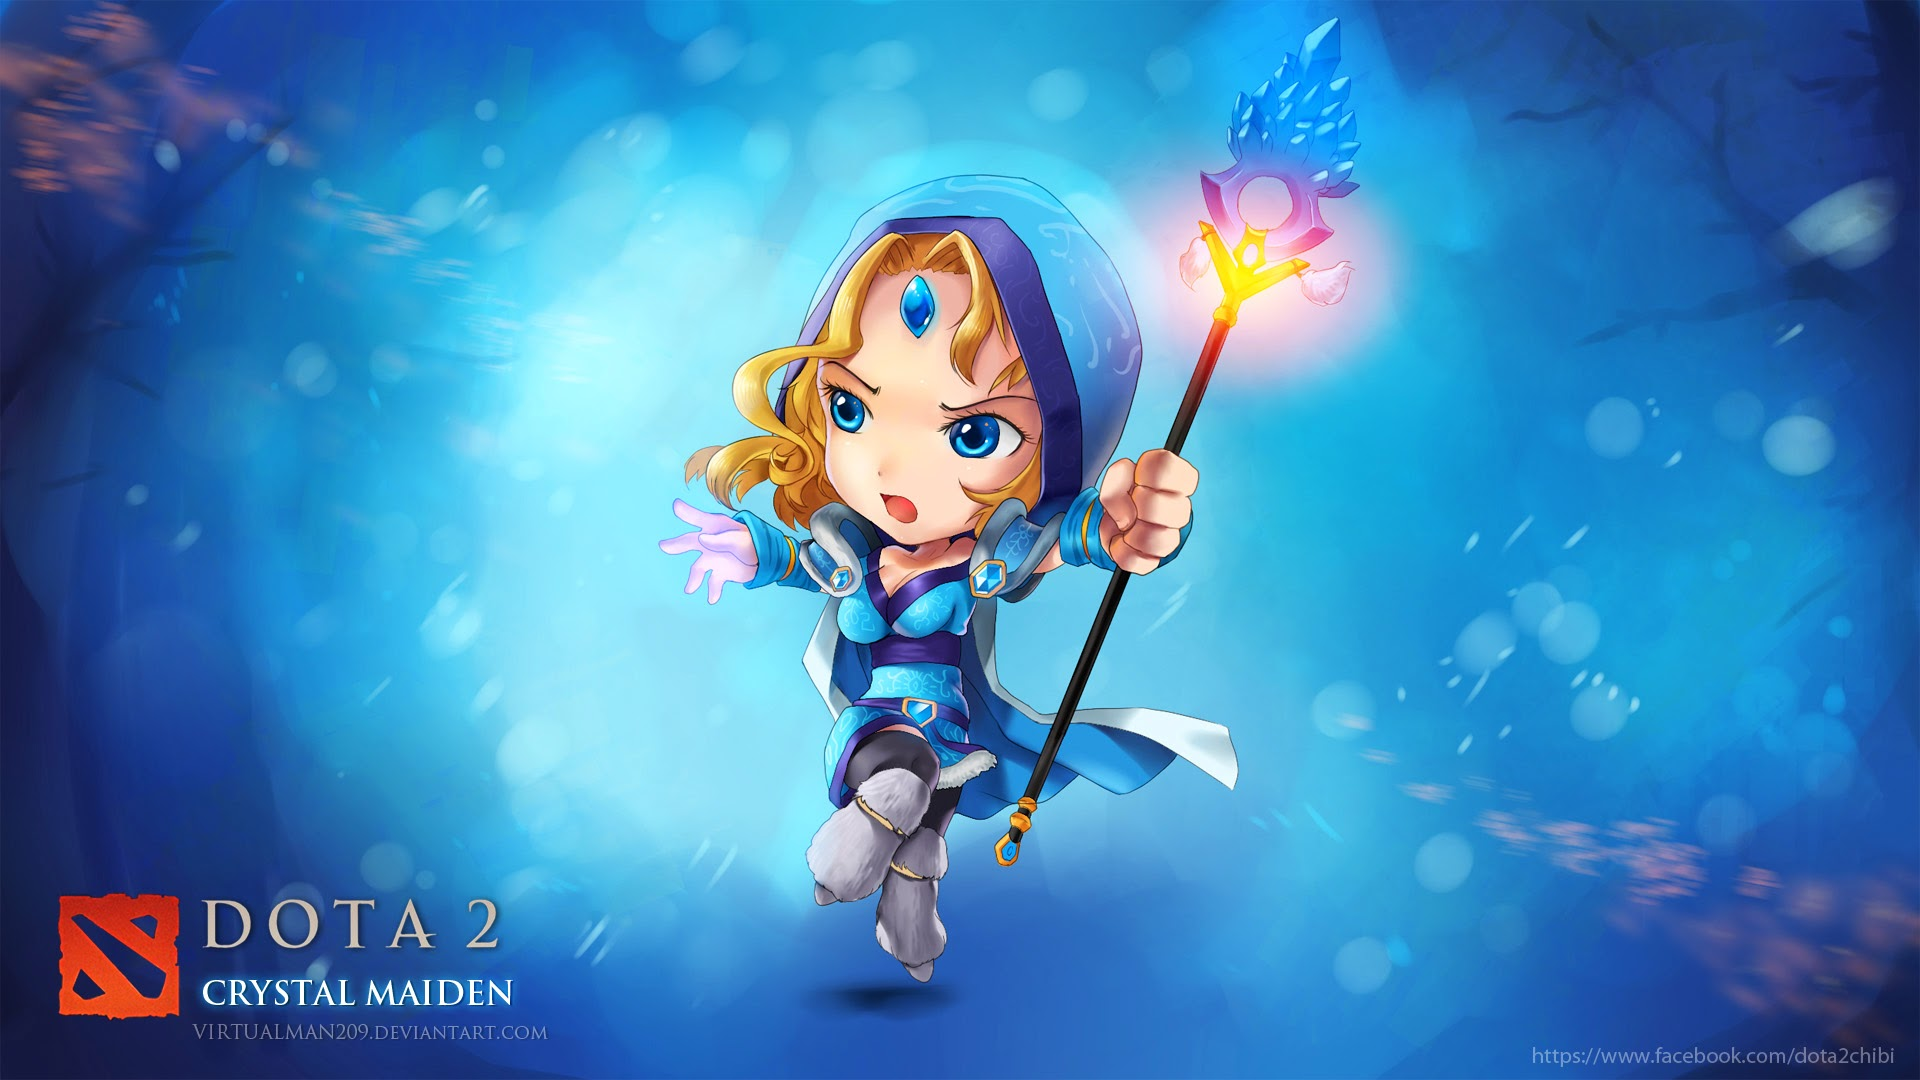 ryali chibi crystal maiden dota 2 girl hero hd wallpaper 1920x1080 62 Rylai Dota 2 Chibi